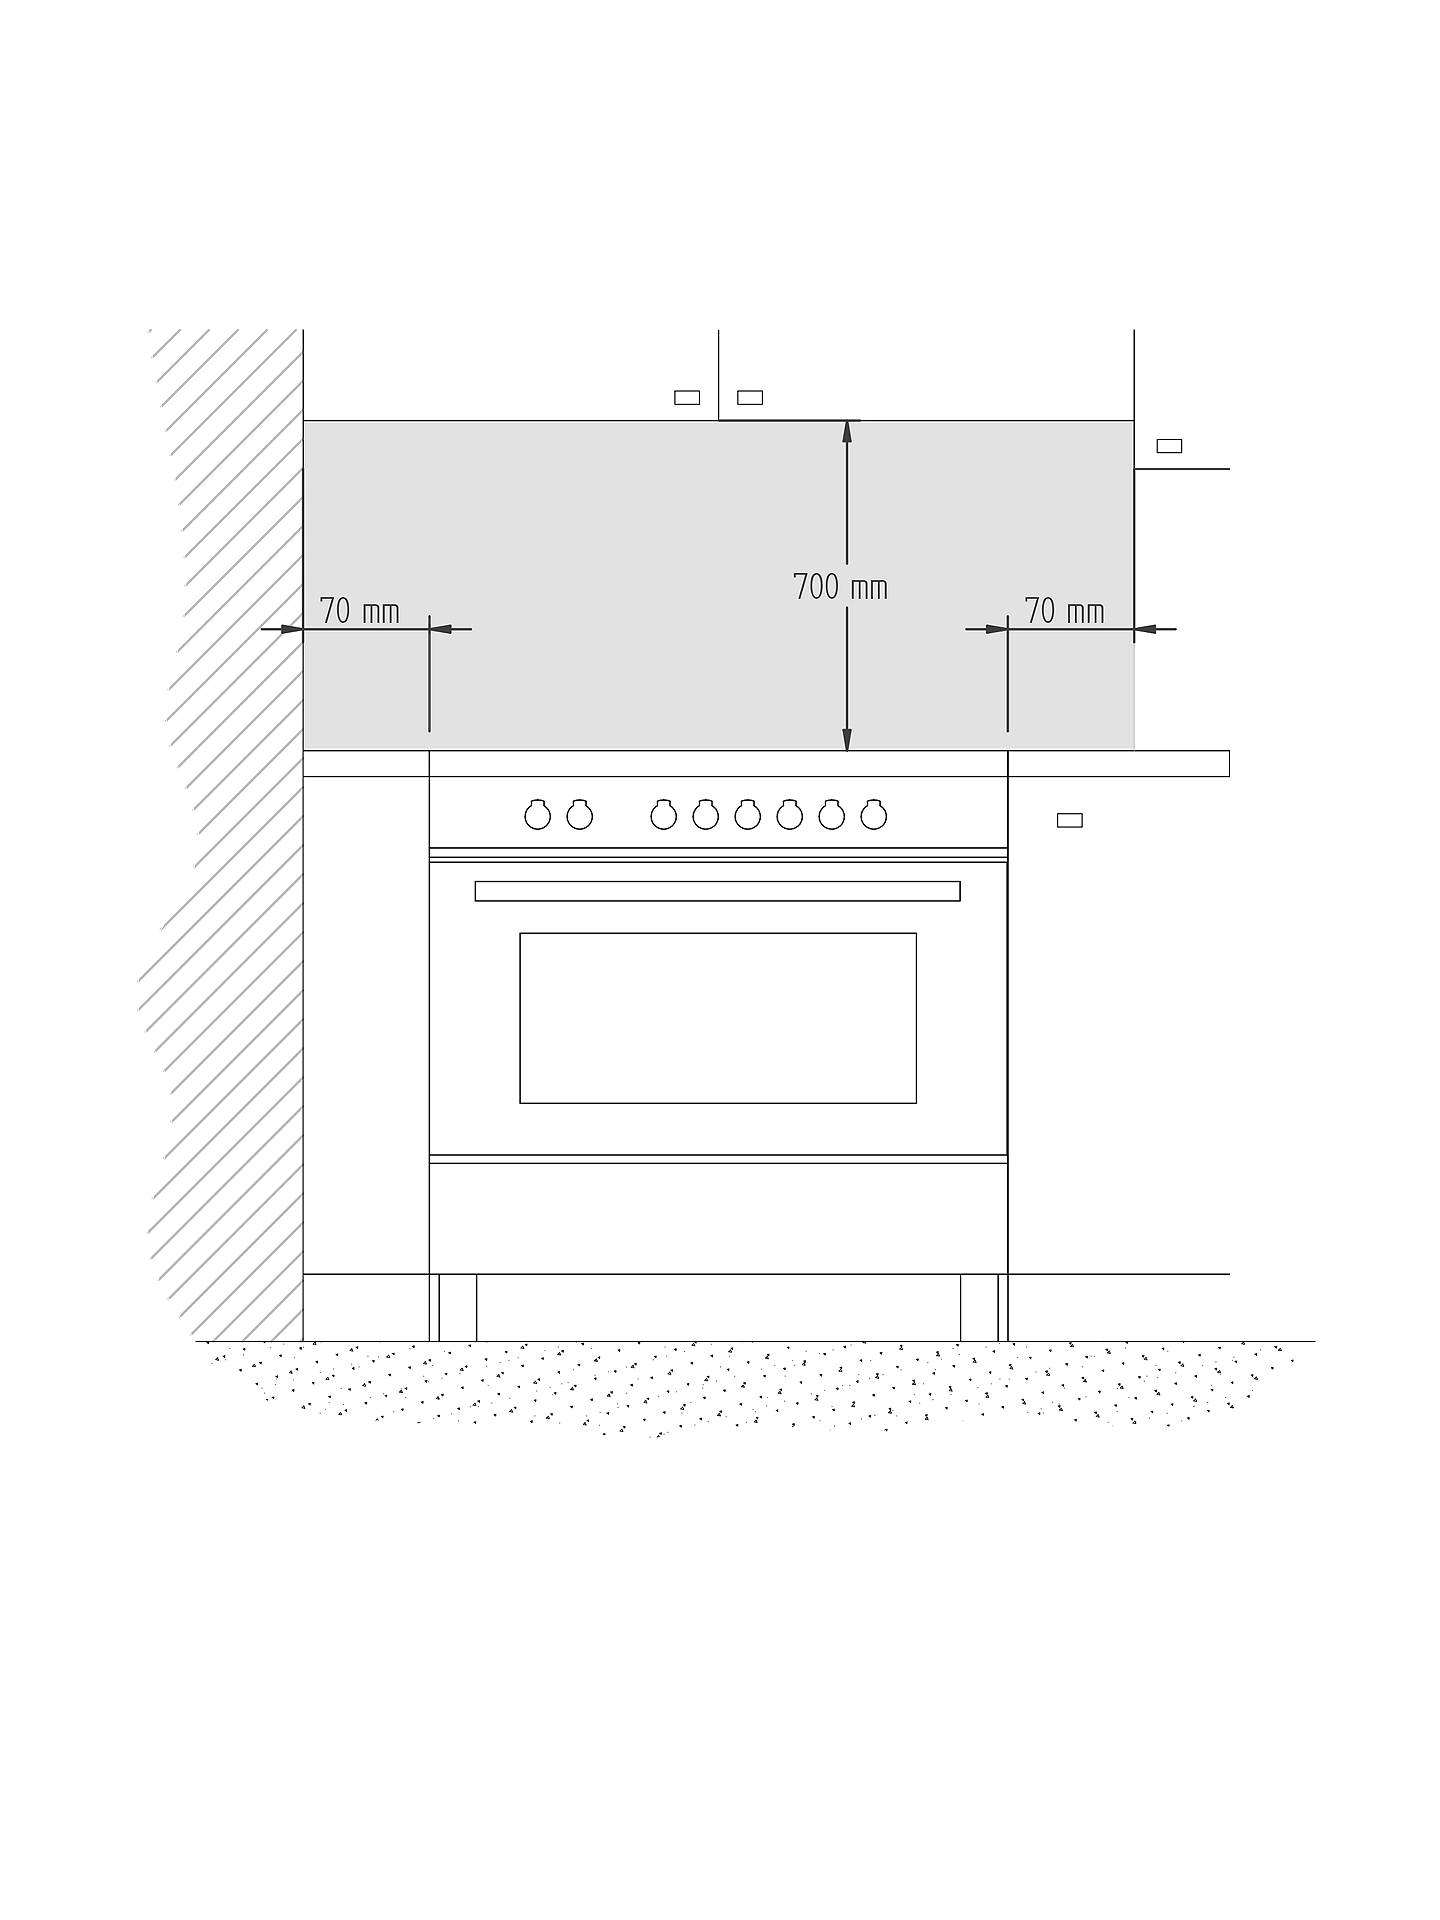 Abc Oil Burner Wiring Diagram on